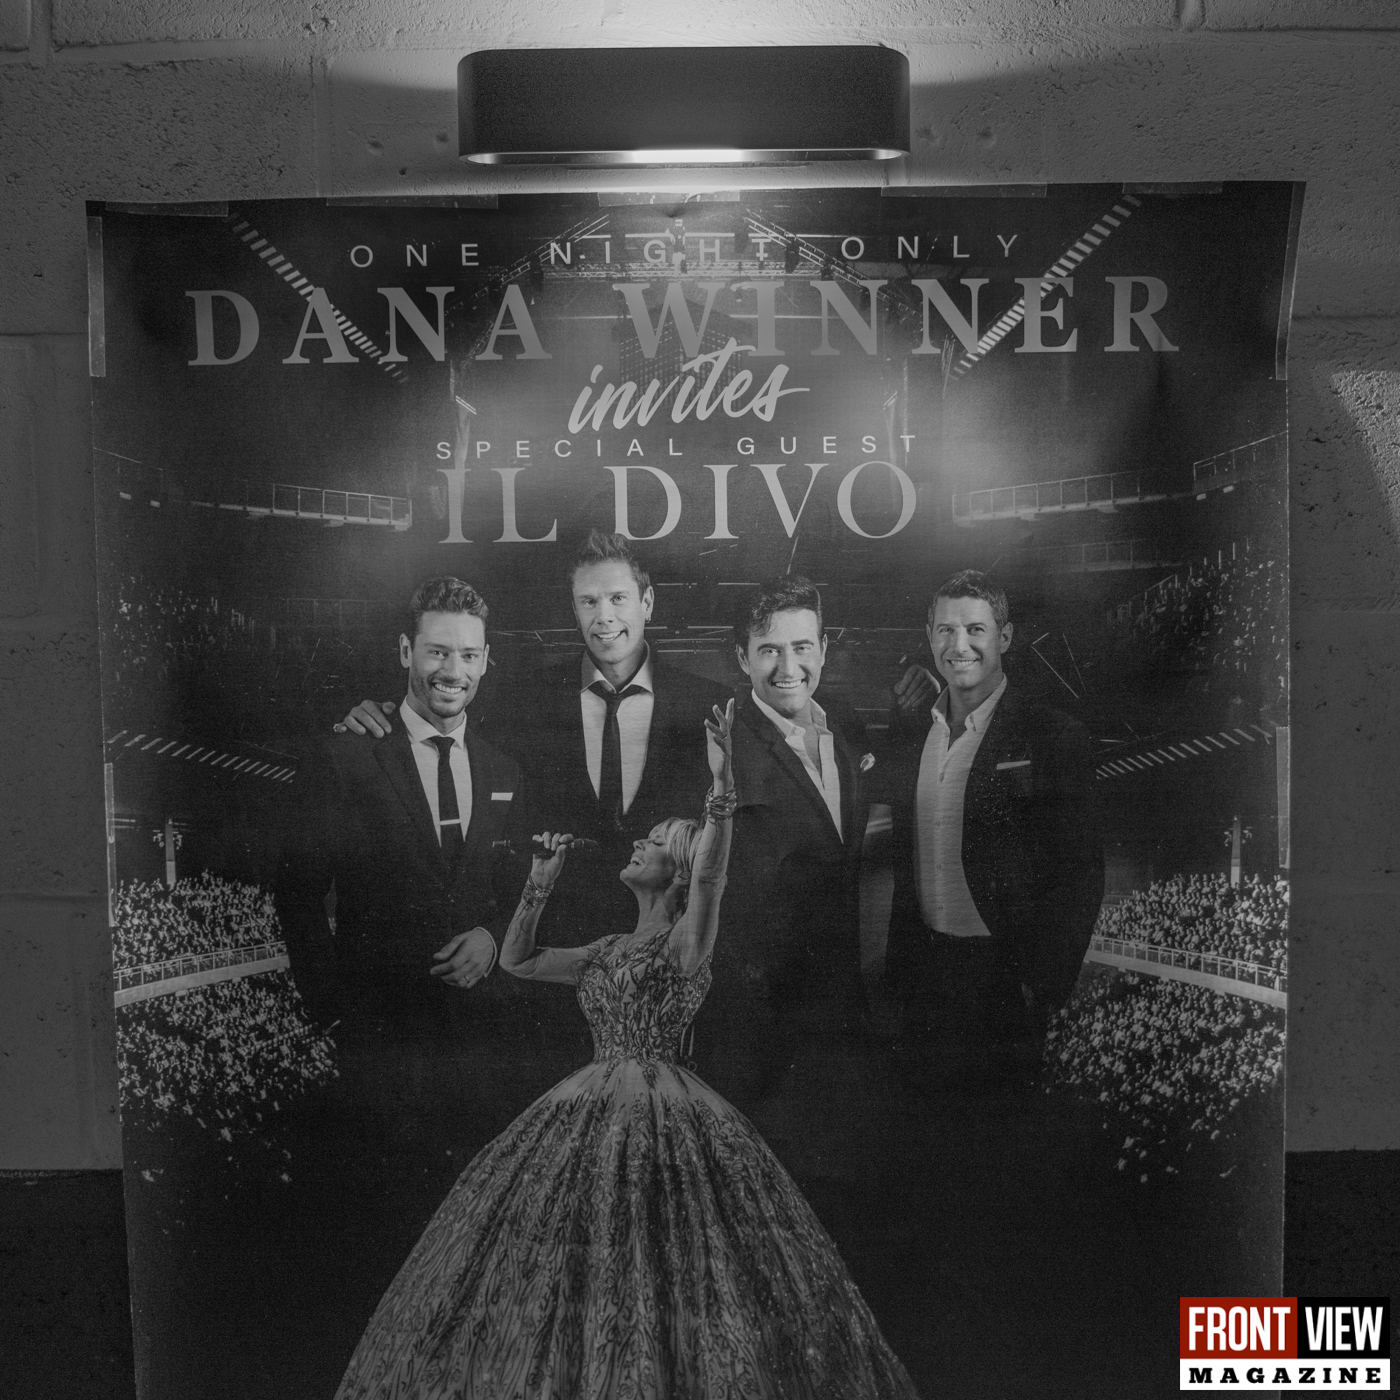 Persconferentie Dana Winner invites ... - one night only - 9